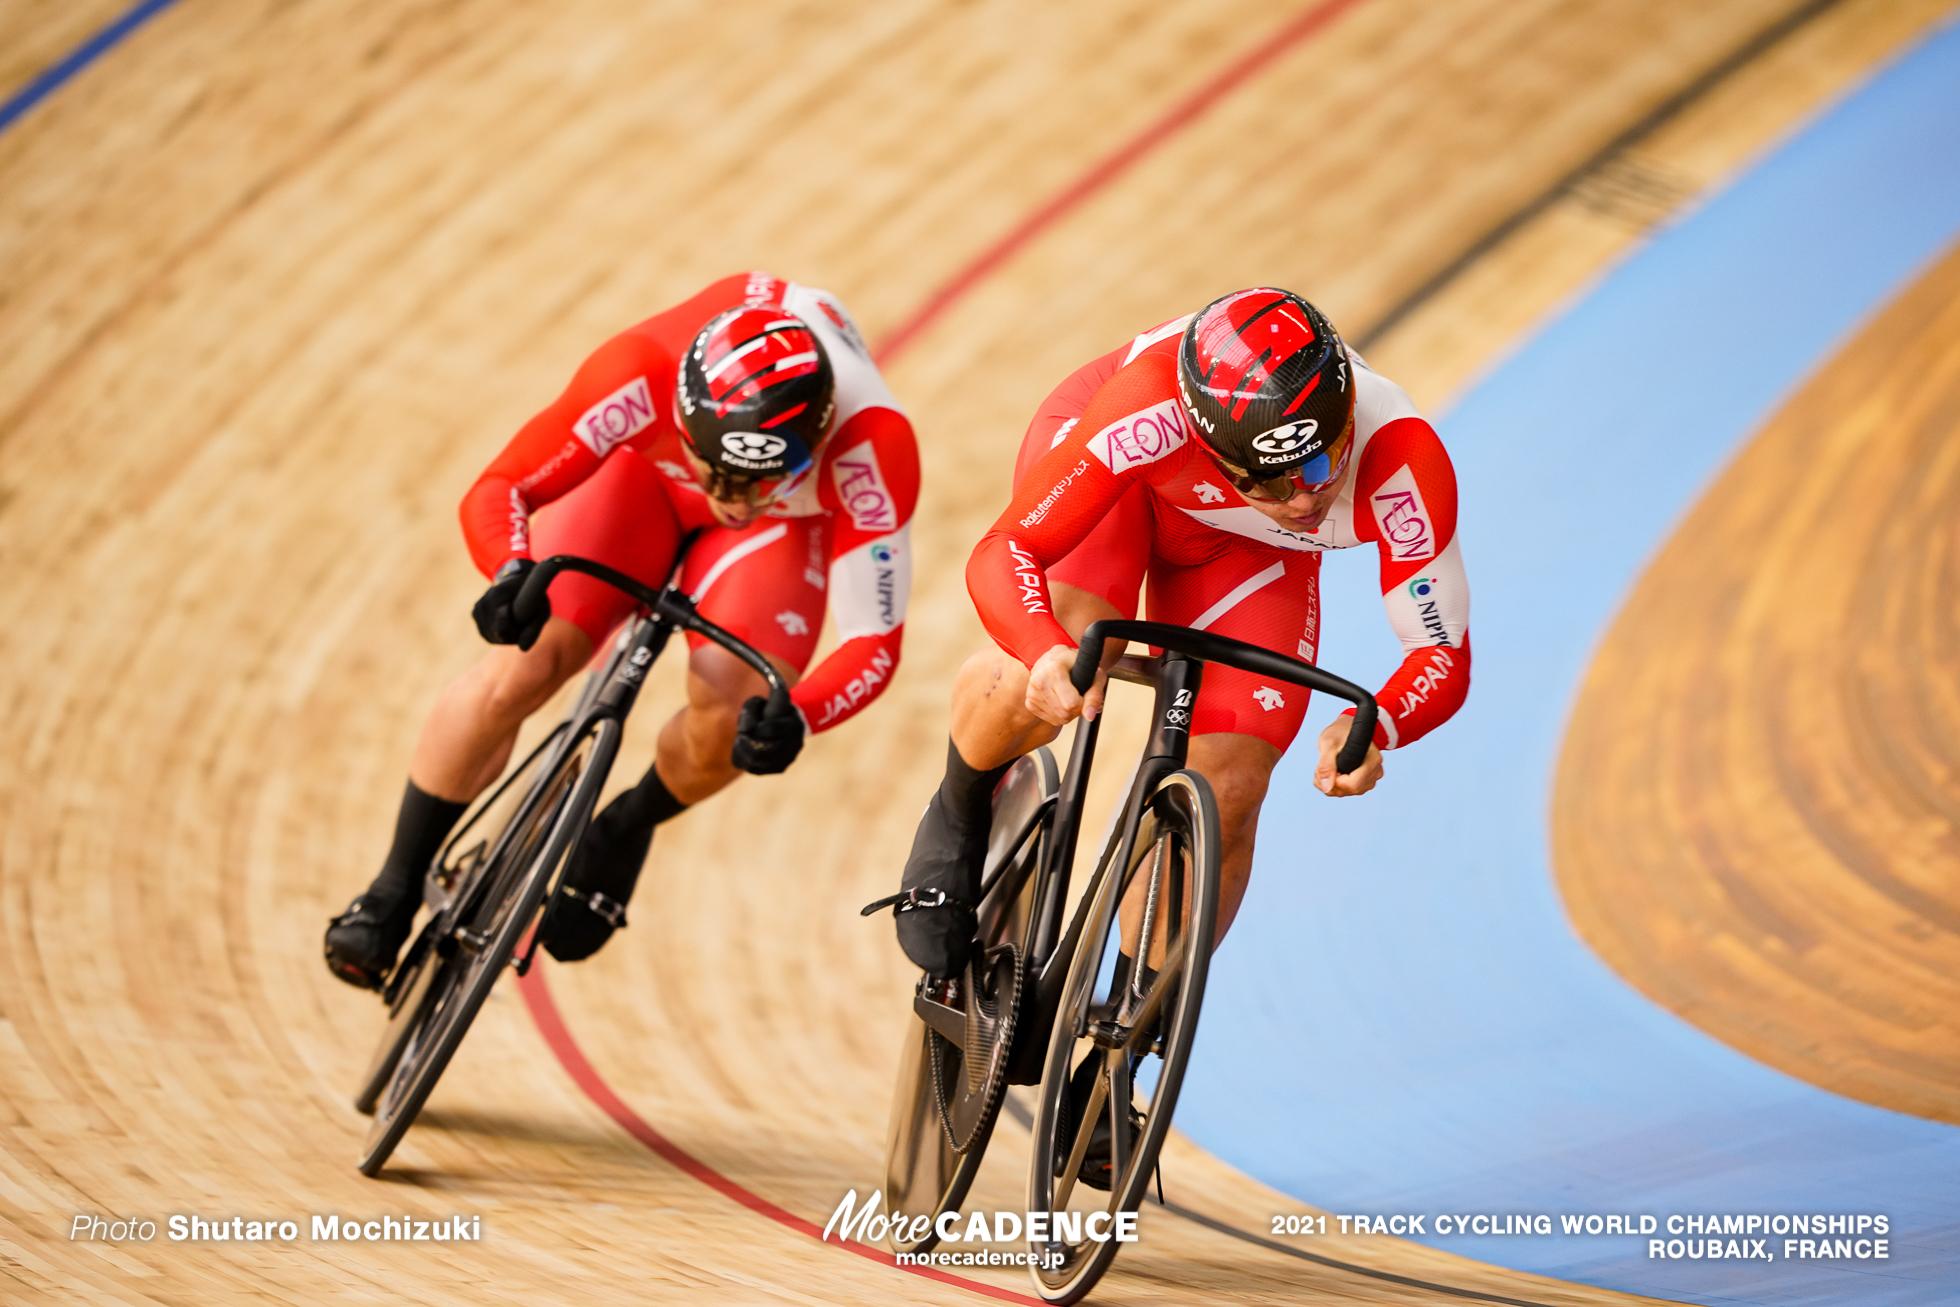 Men's Sprint 1/16 Finals / 2021 Track Cycling World Championships, Roubaix, TERASAKI Kohei(JPN)寺崎浩平, YAMASAKI Kento(JPN)山﨑賢人